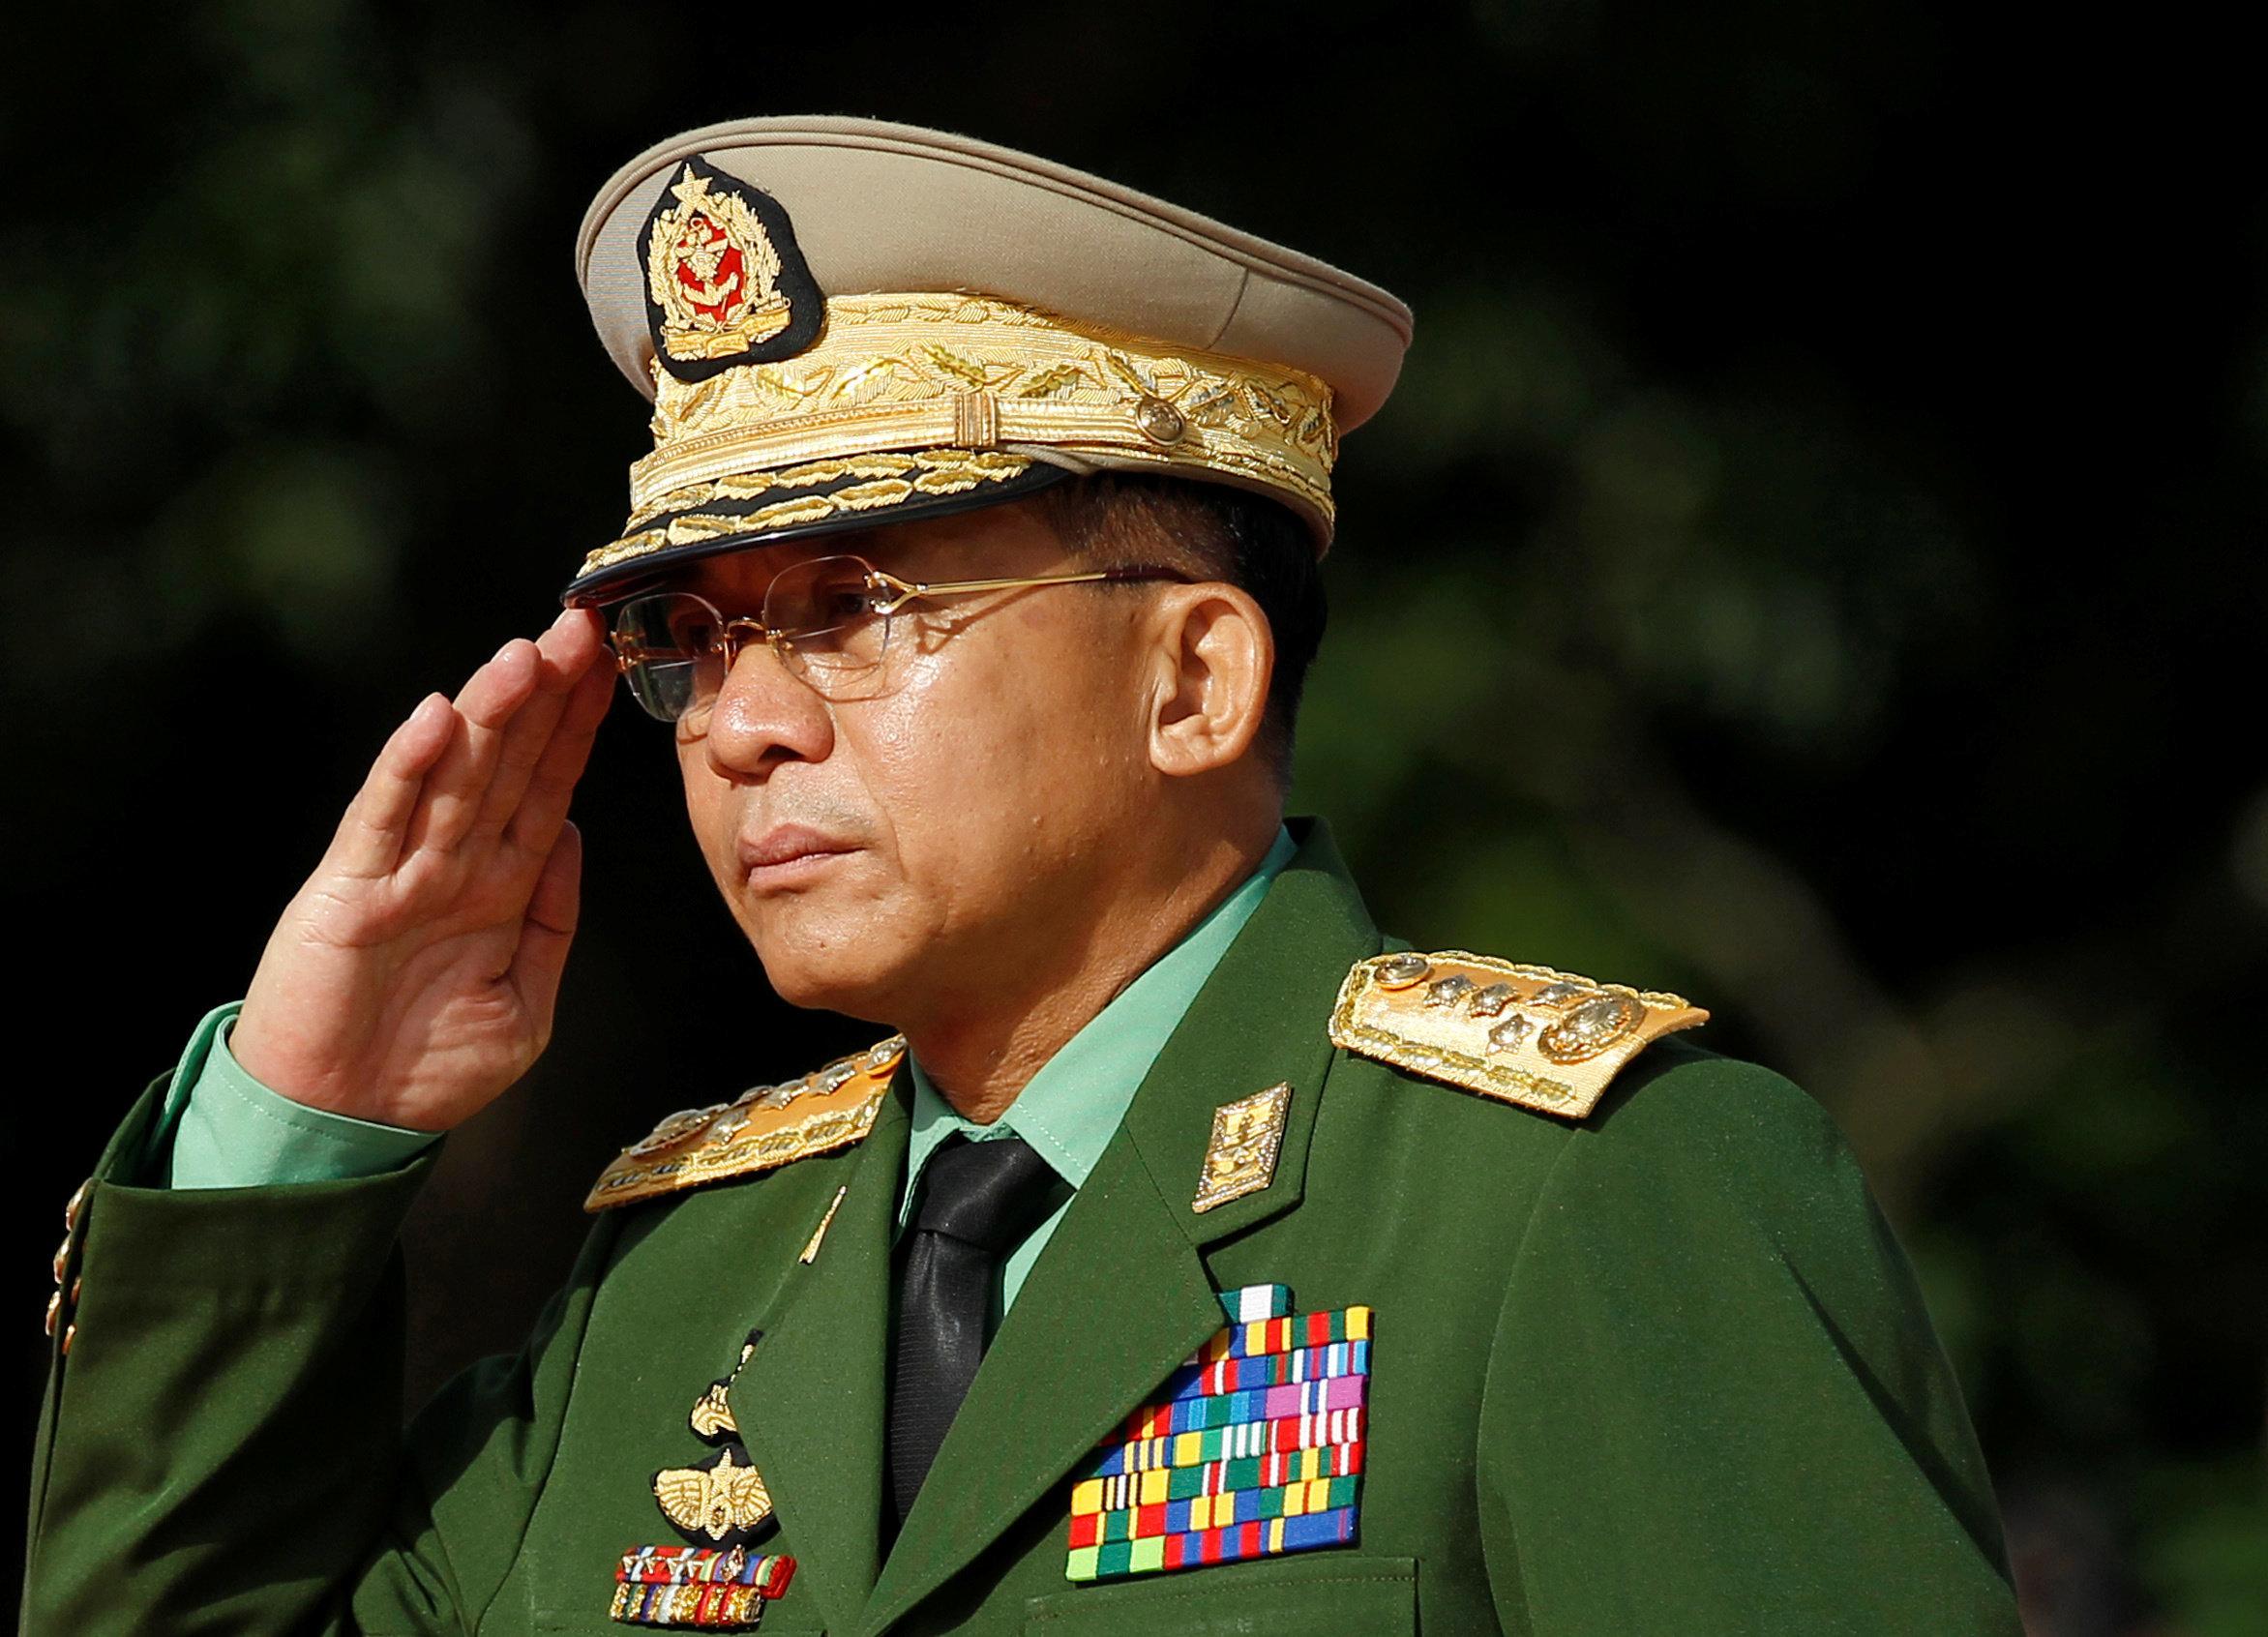 UNSC Expresses 'Deep Concern' Over Rohignya Crisis in Myanmar